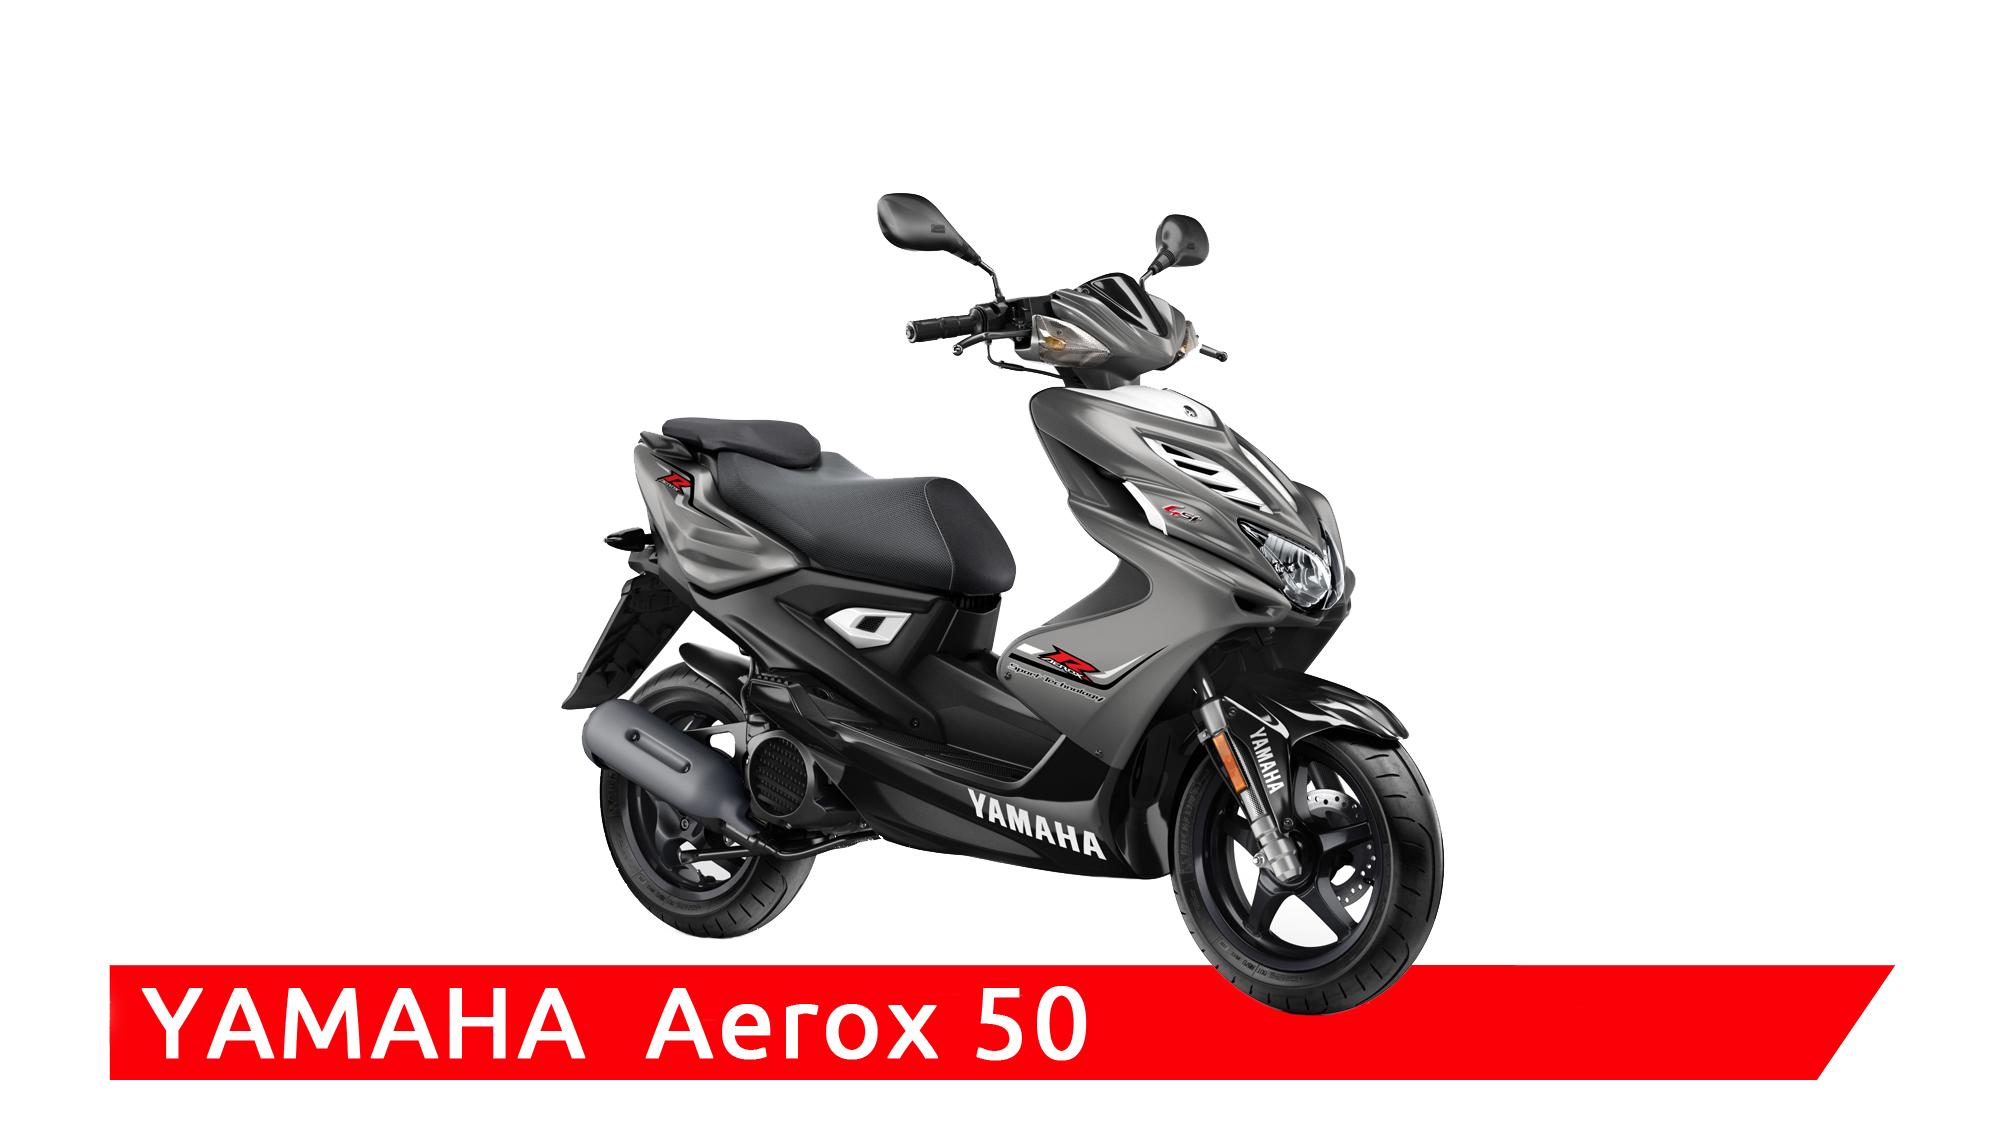 Aerox 50